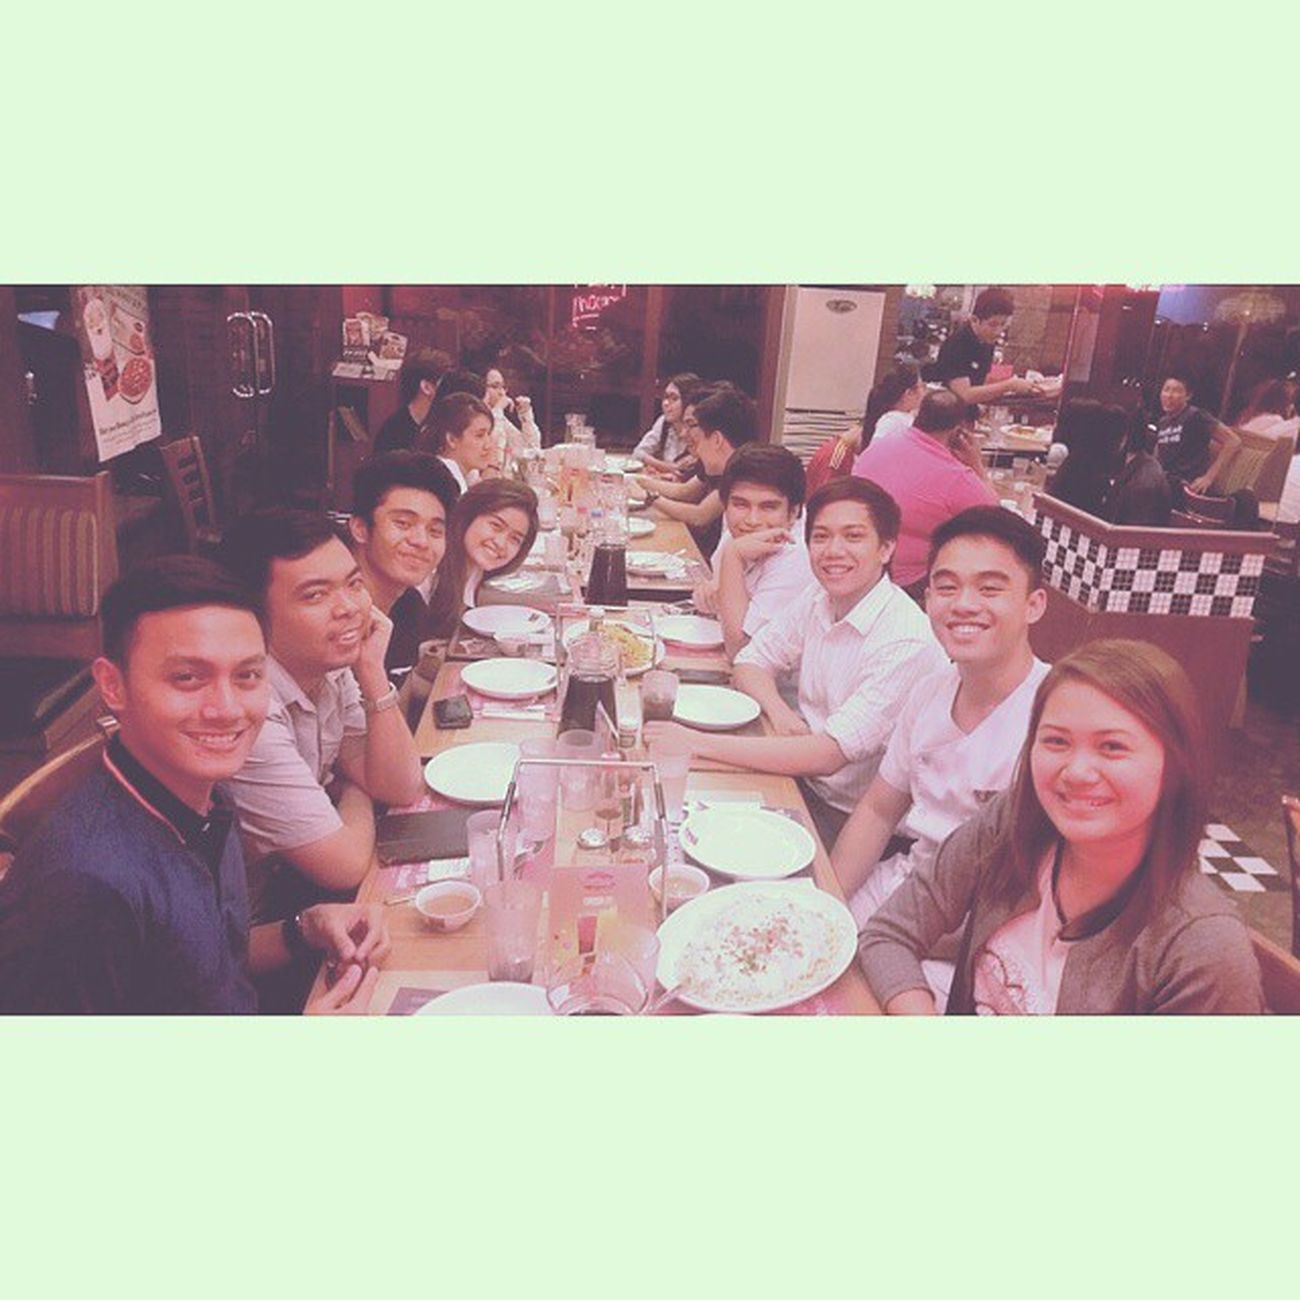 Had my lunch and dinner at Shakeys. UmayNa Goodfriends Alumni IABFSC Kamustahan